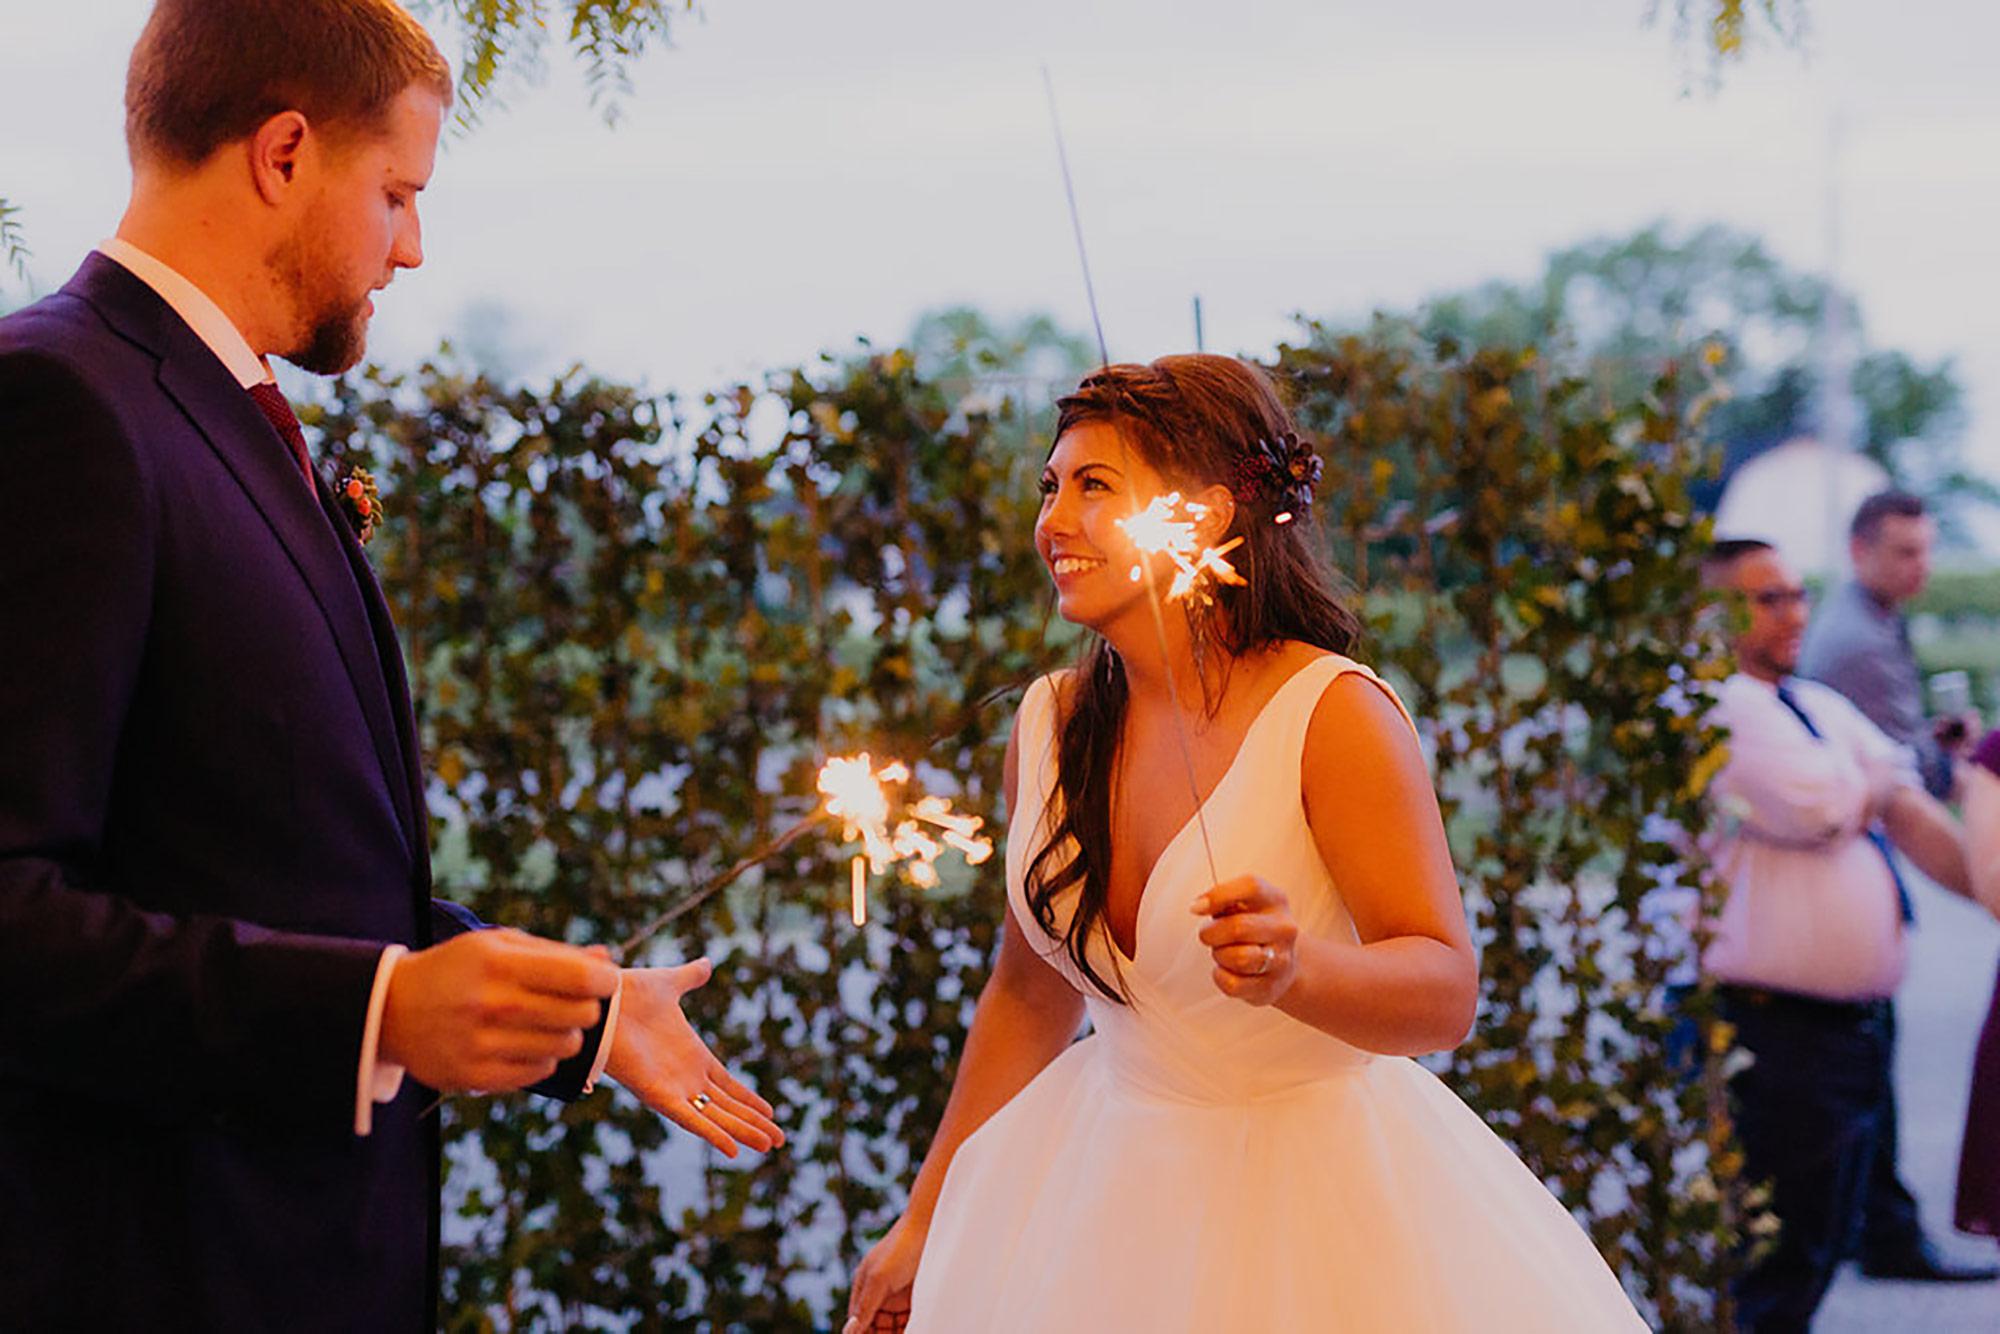 Kurtz-Orchards-Wedding-Niagara-wedding-Vineyard-Bride-Photography-by-Kayla-Rocca-049.JPG